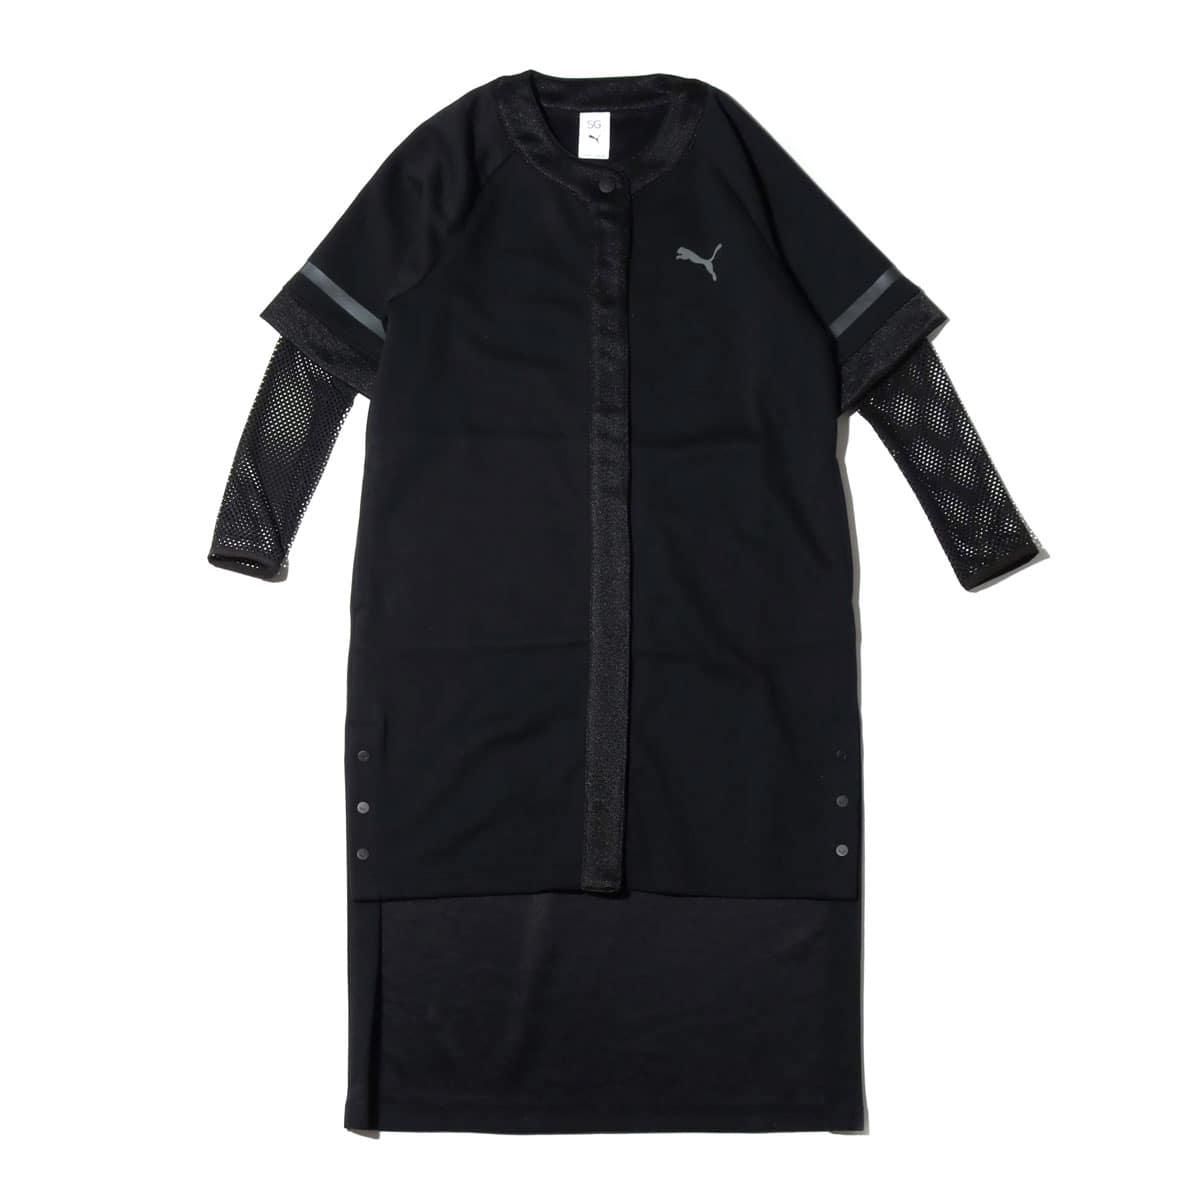 PUMA × SG DRESS  PUMA BLACK_photo_large